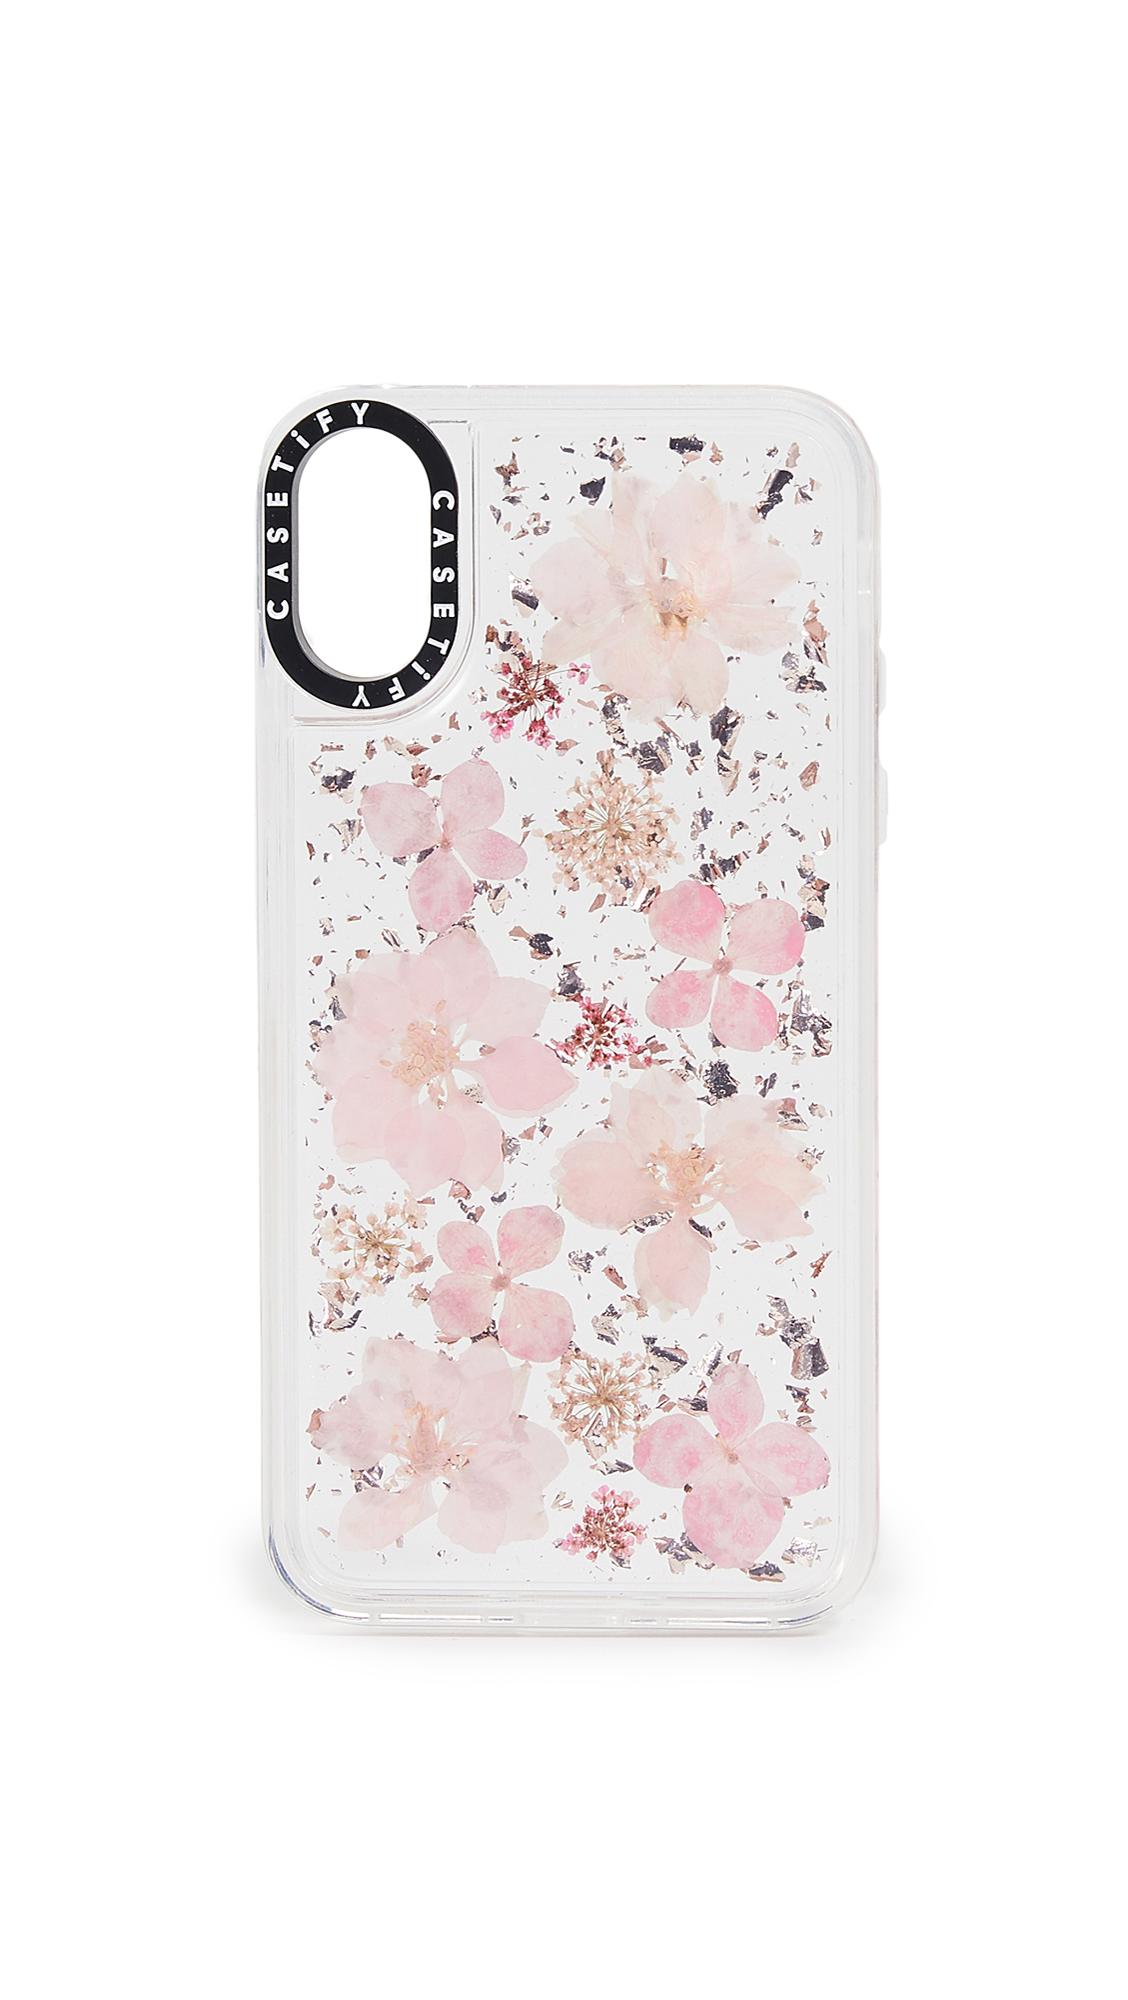 CASETIFY Pressed Flower Sakura Iphone X / Xs Case in Multi